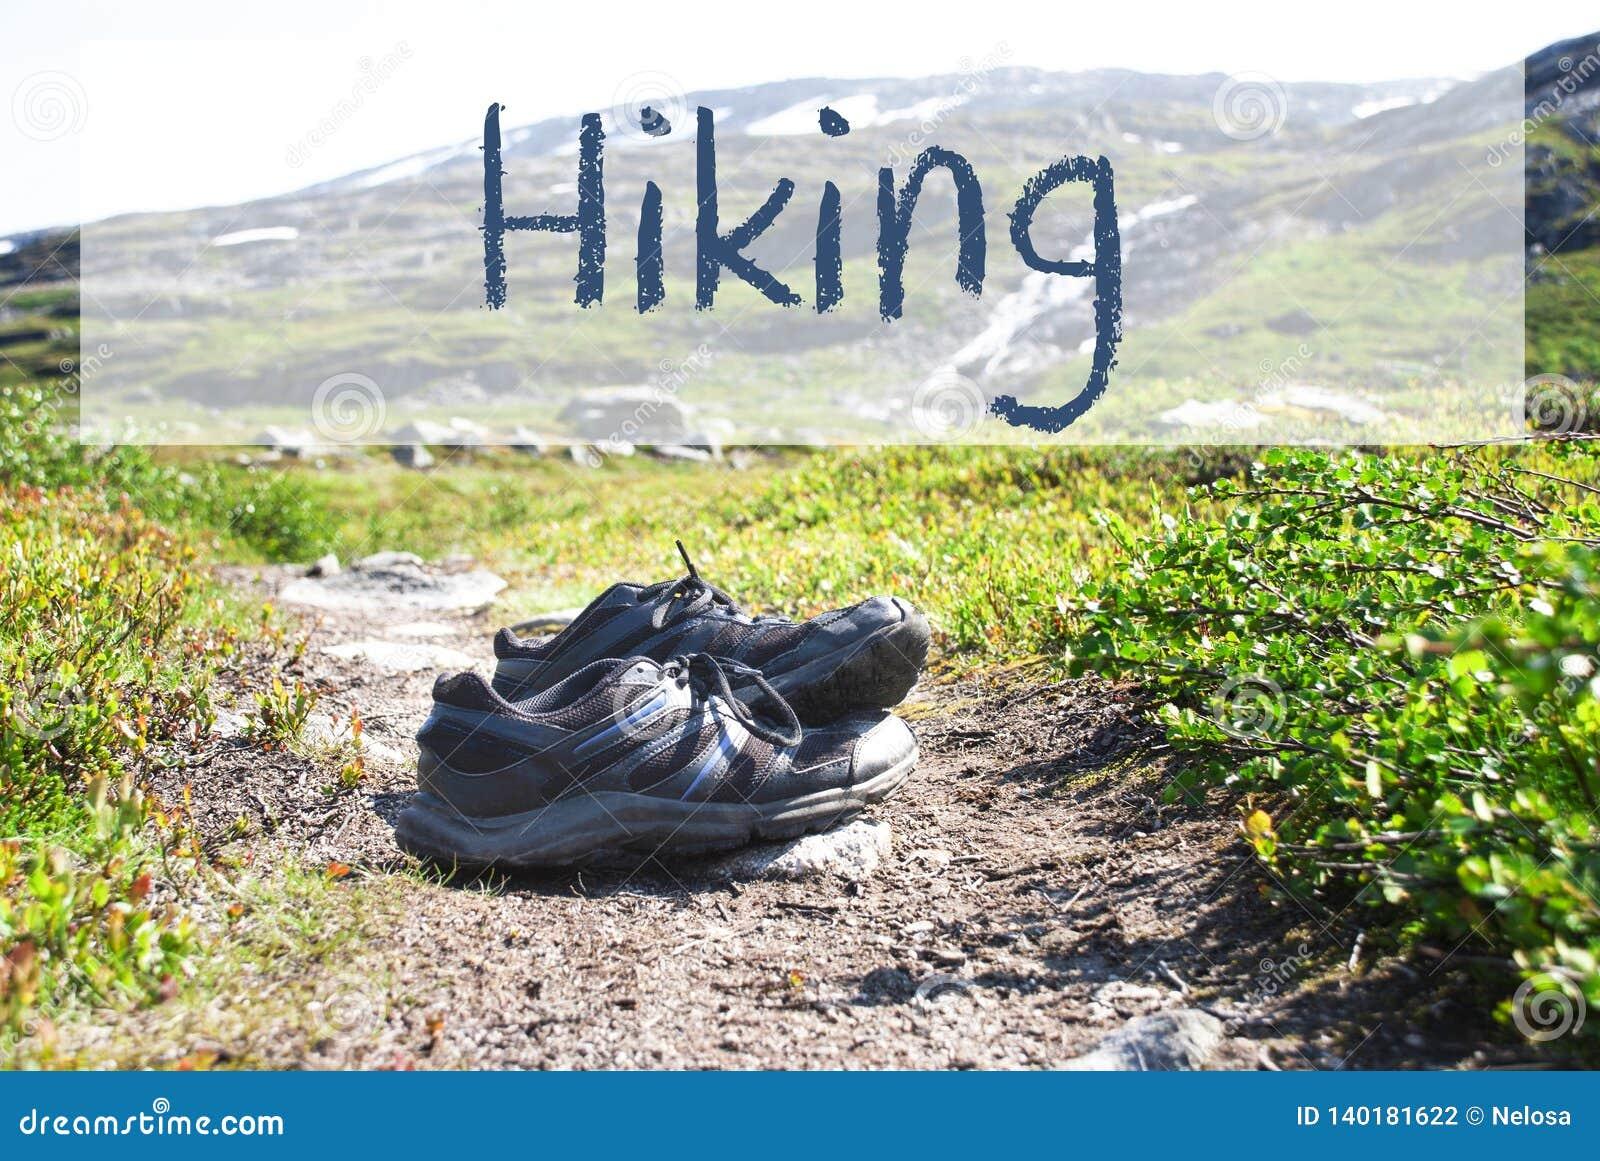 Sapatas no trajeto Trekking, caminhada inglesa do texto